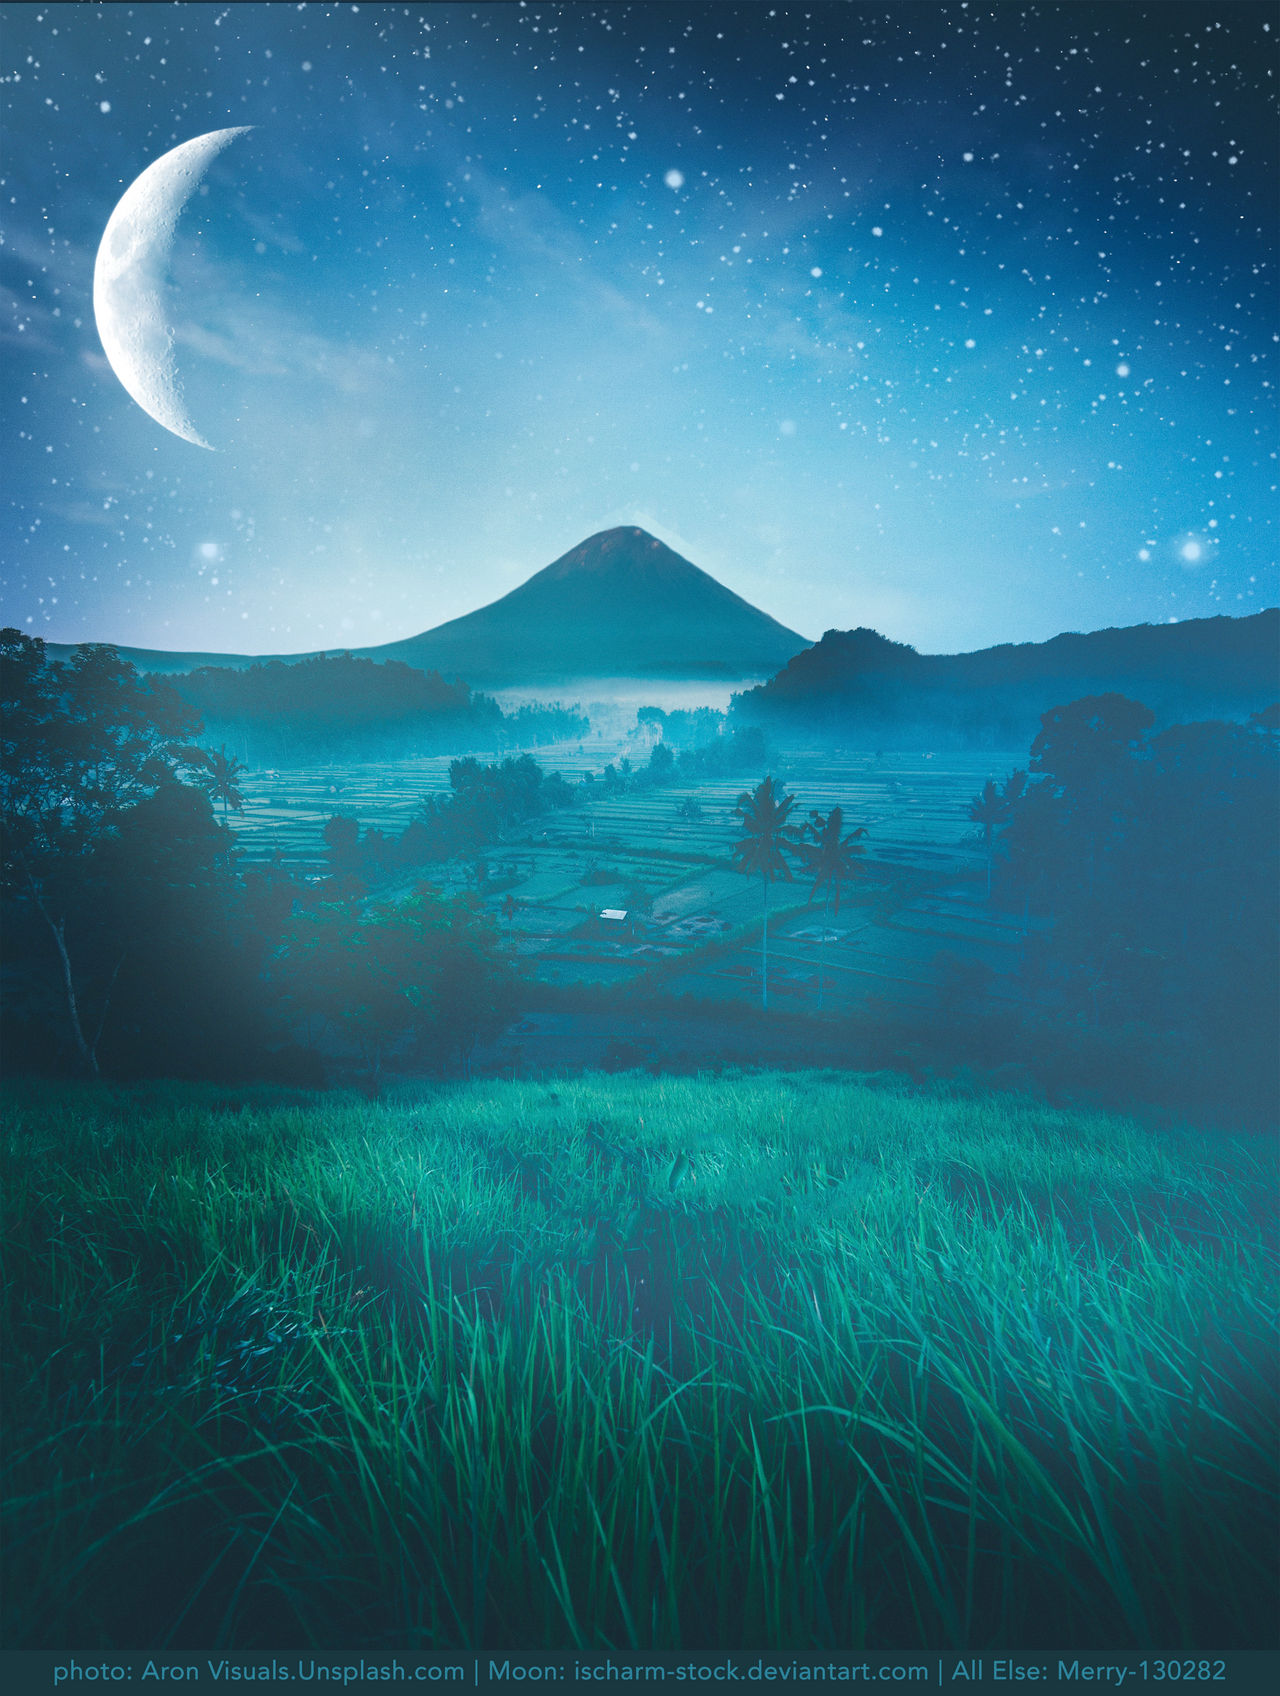 Moonlight Premade Background